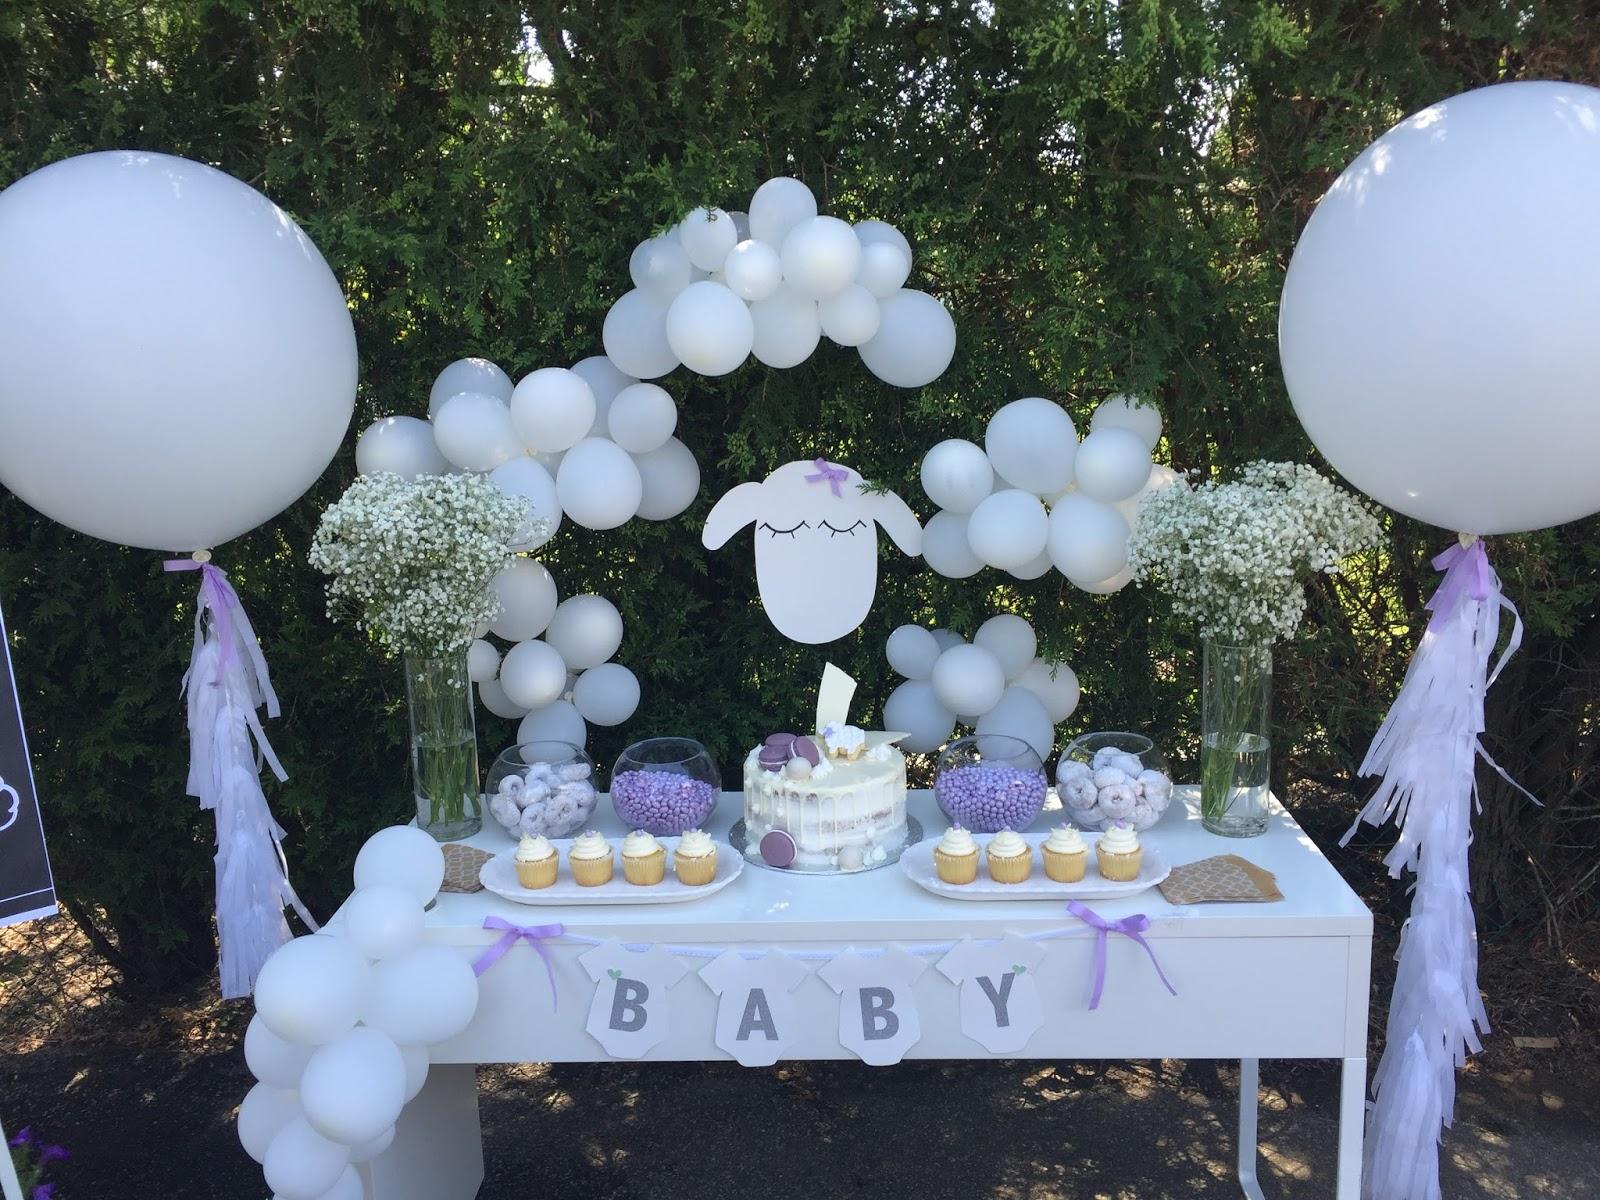 FEATURE: Little Lamb Baby Shower | Popular Party Planning Blog |  Celebration Stylist